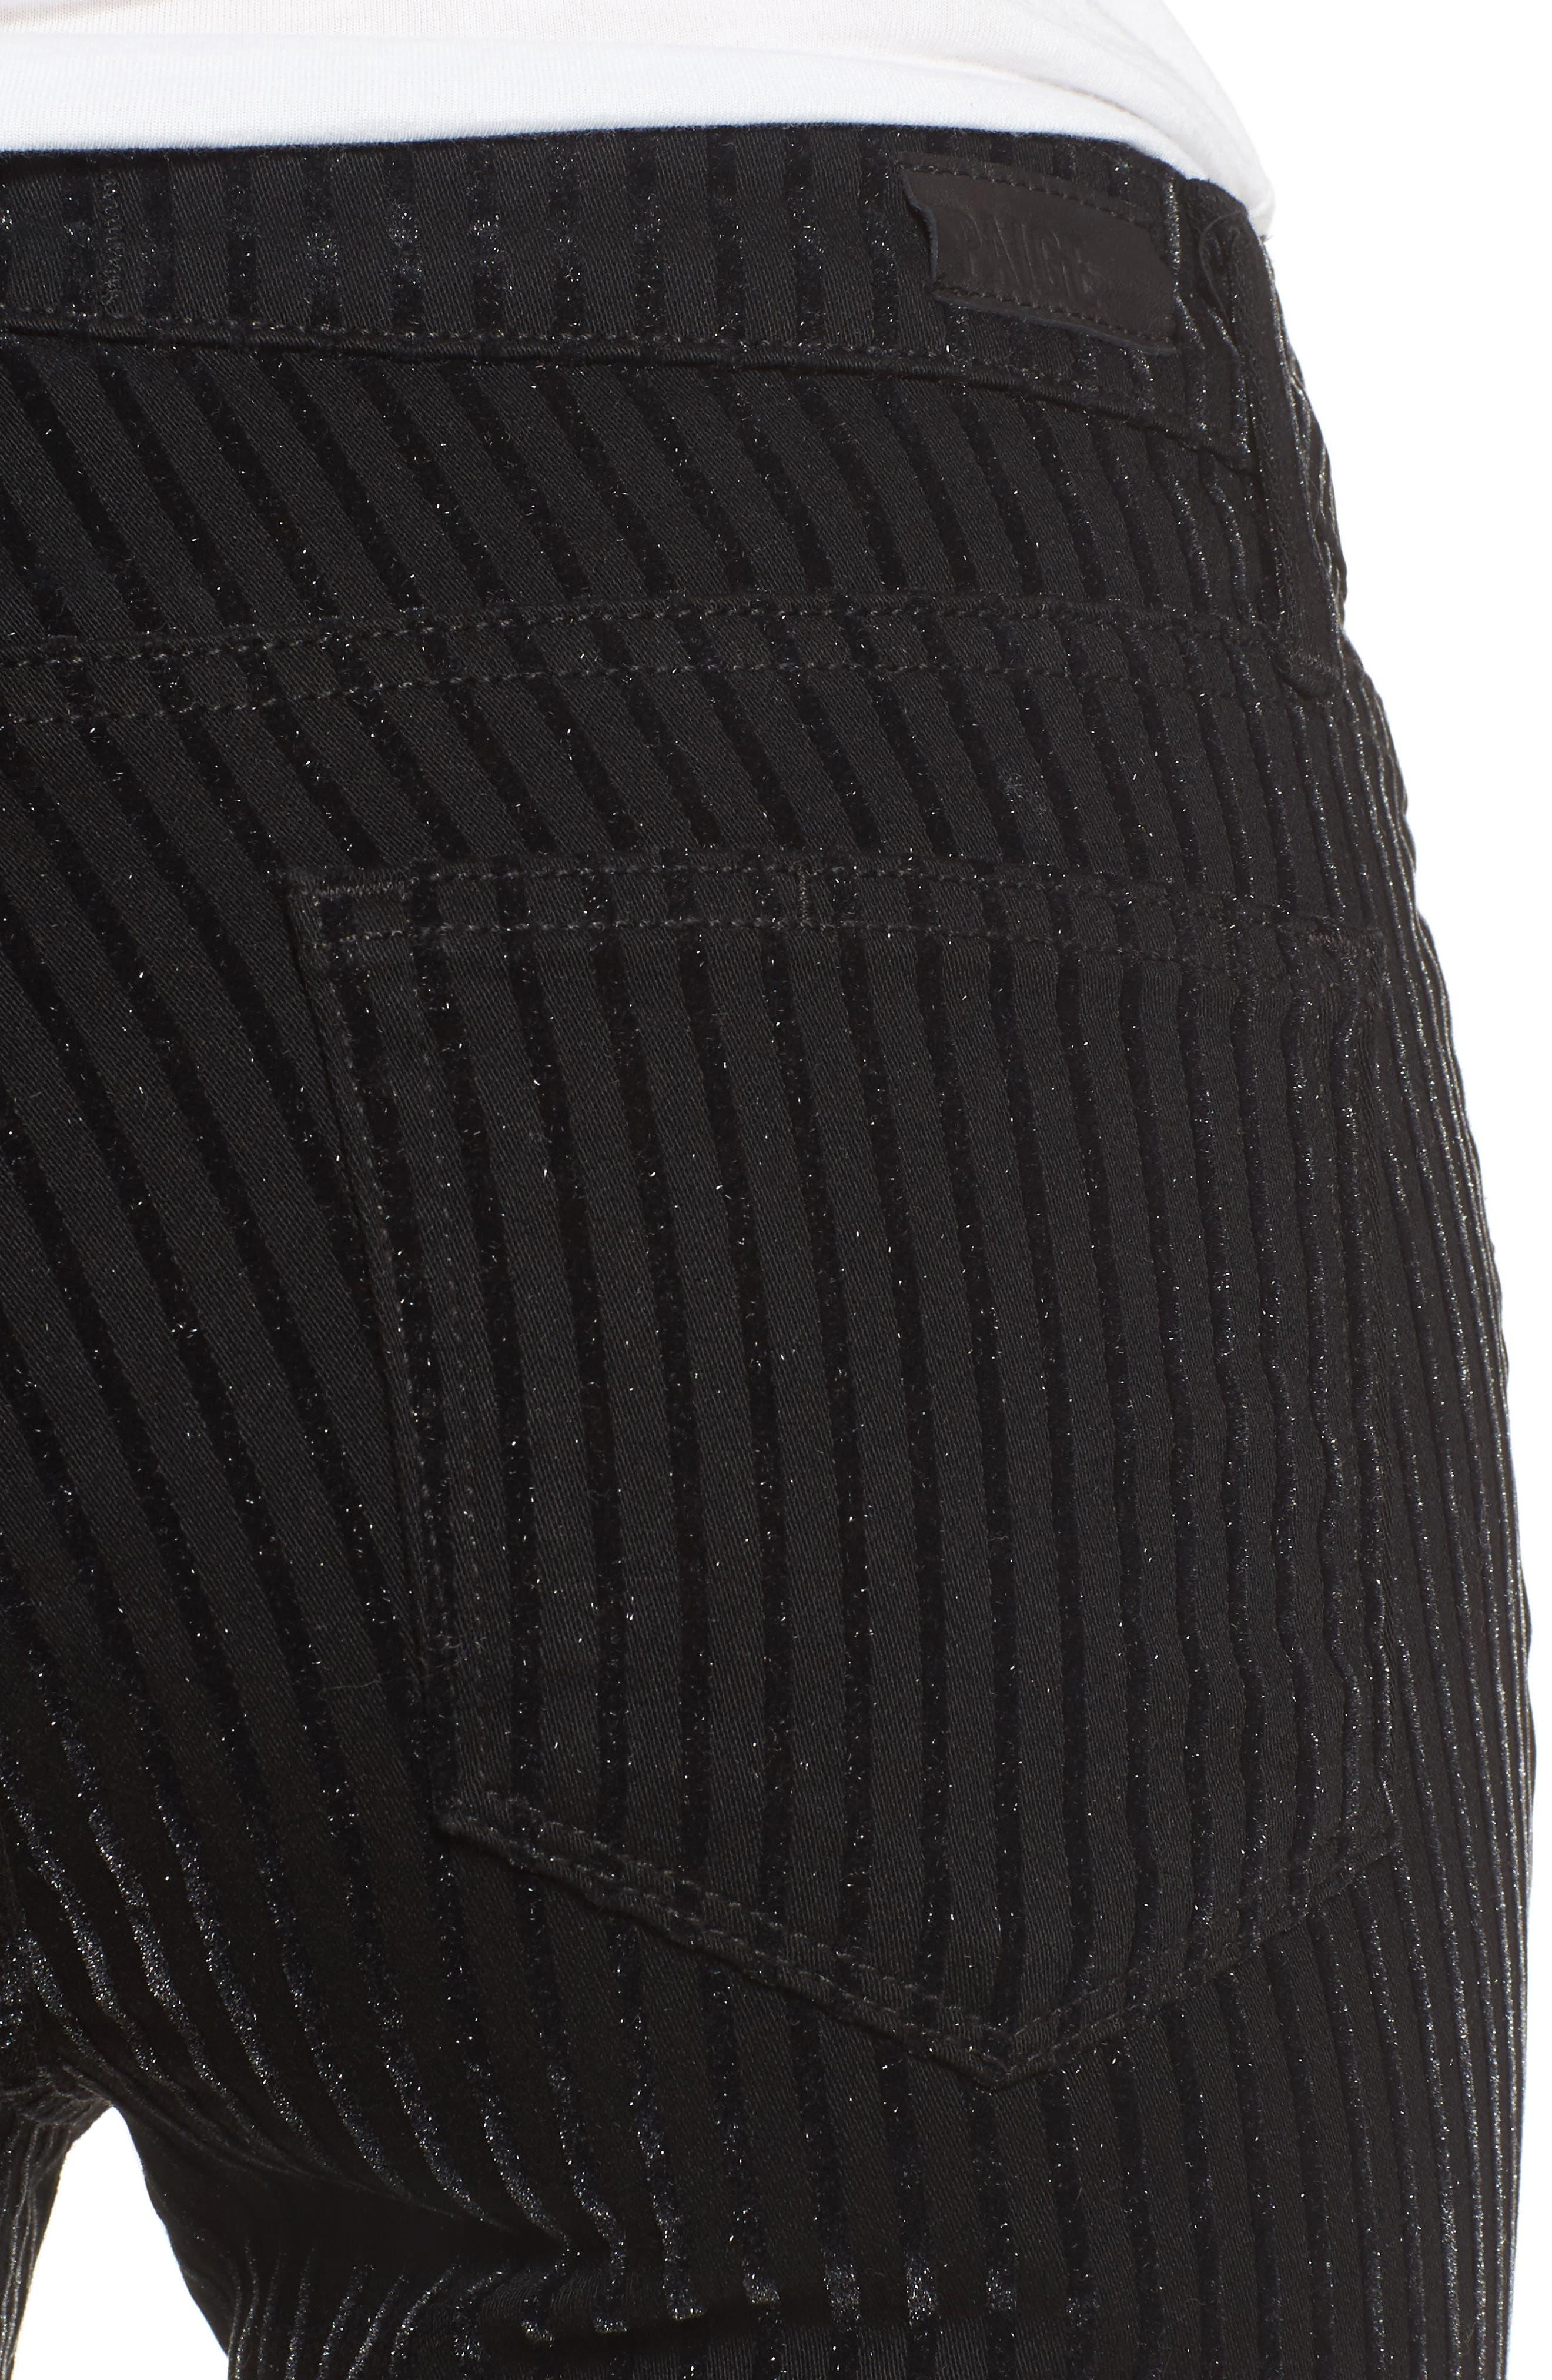 Verdugo Ultra Skinny Jeans,                             Alternate thumbnail 4, color,